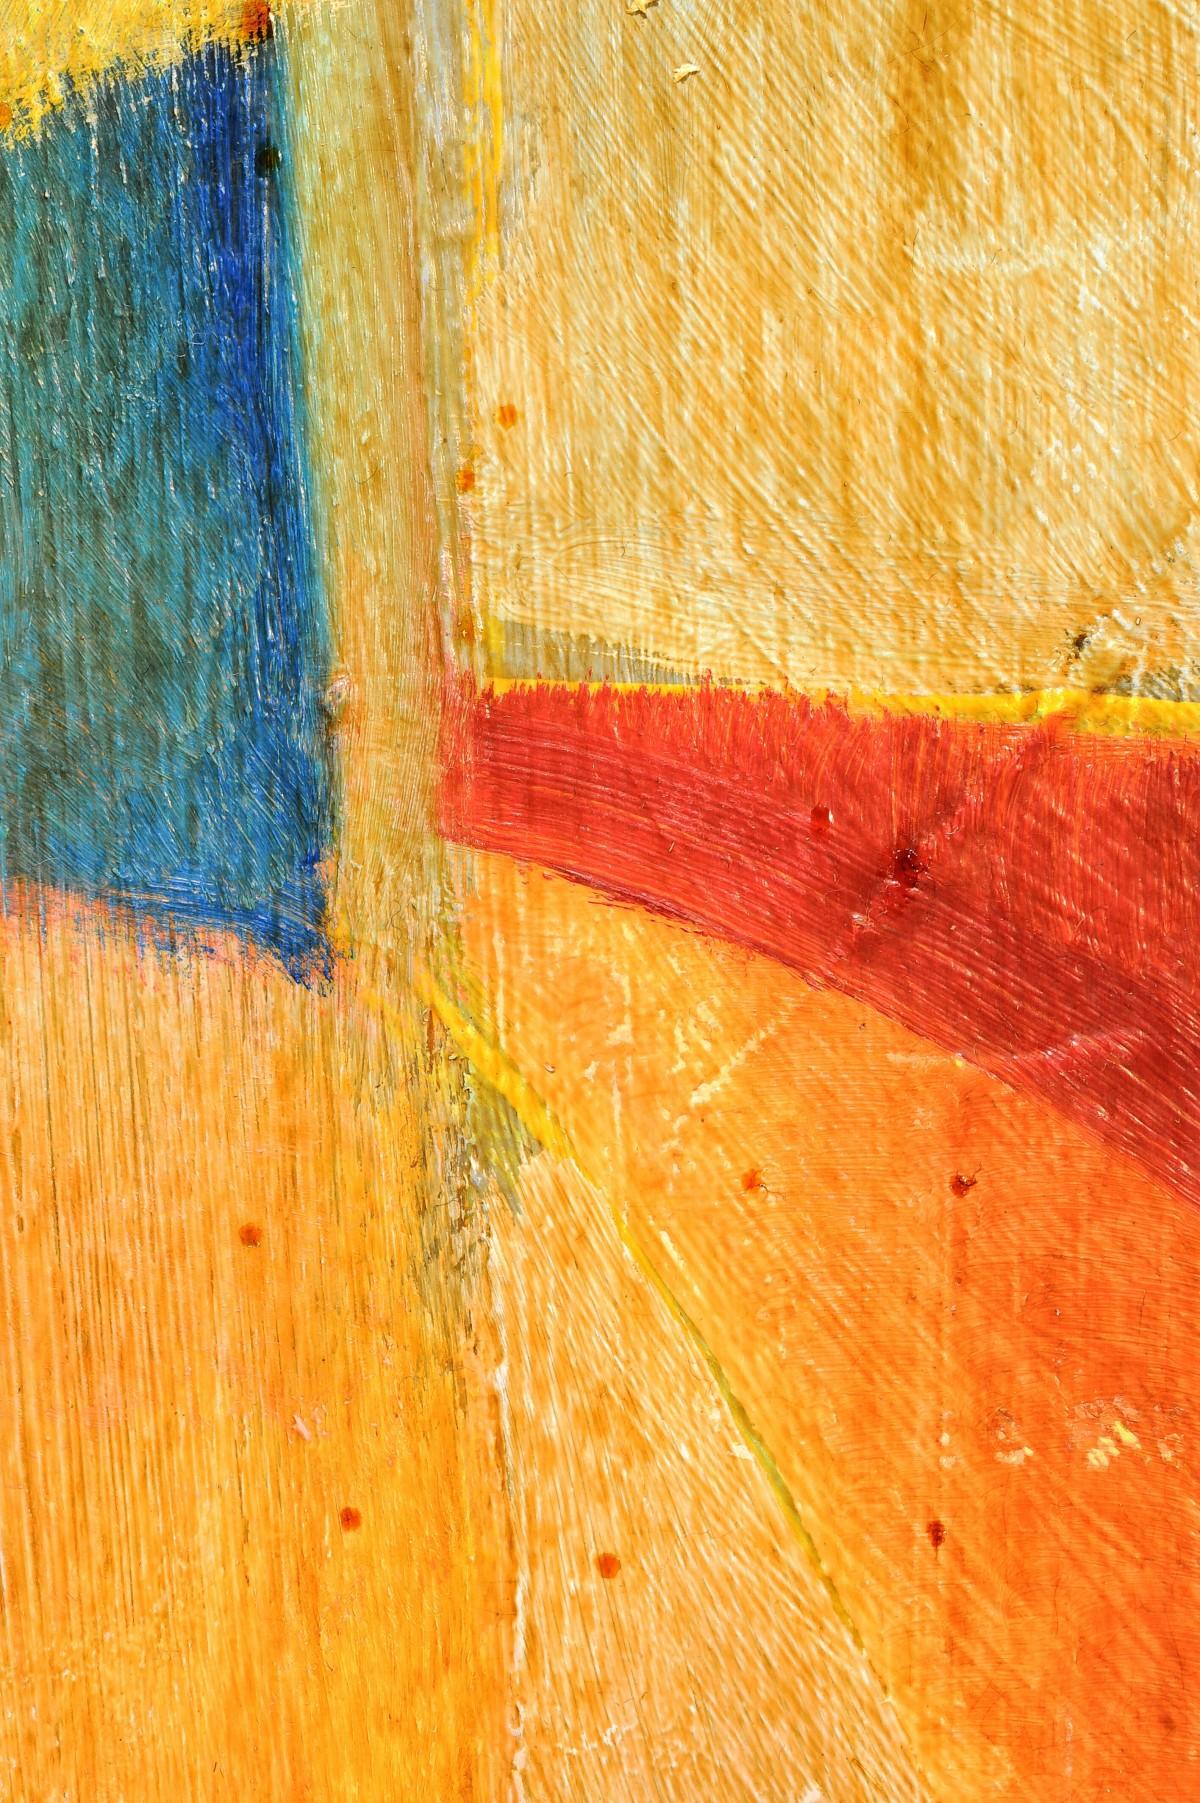 Free Images Plant Wood Texture Floor Wall Orange